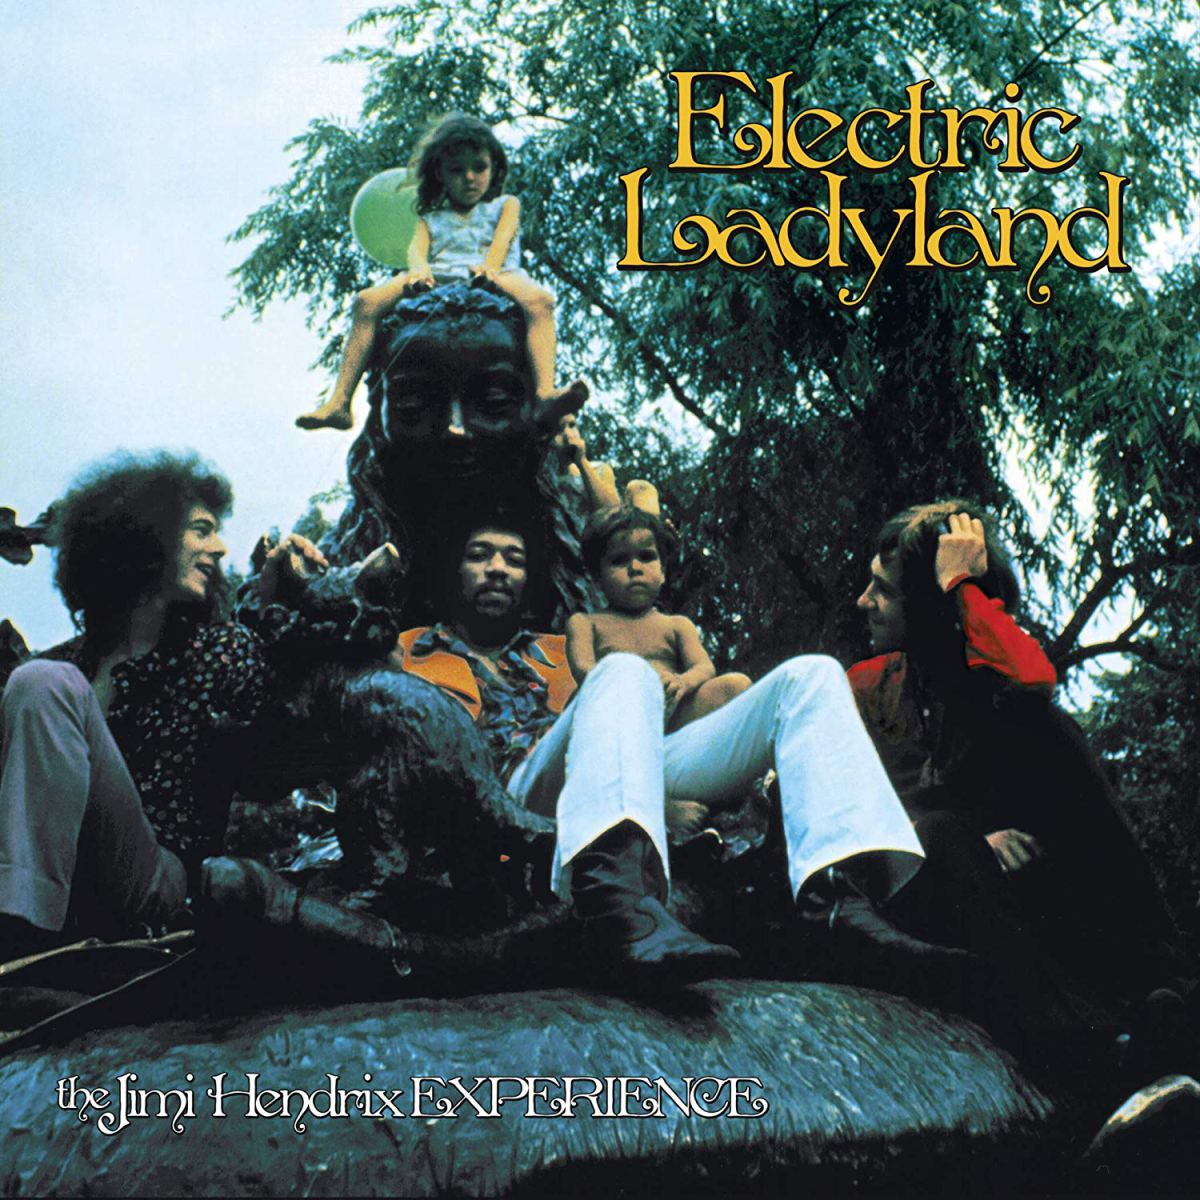 Jimi-Hendrix-Electric-Ladyland-alternative cover